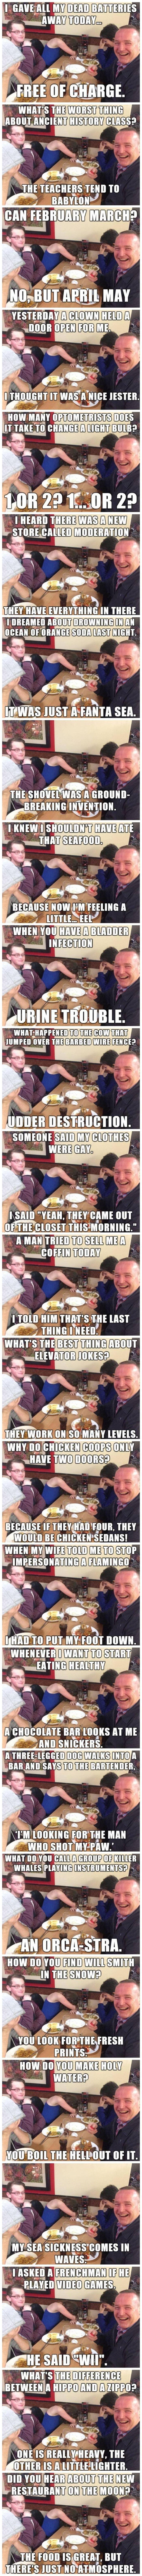 Great Dad Jokes http://ibeebz.com